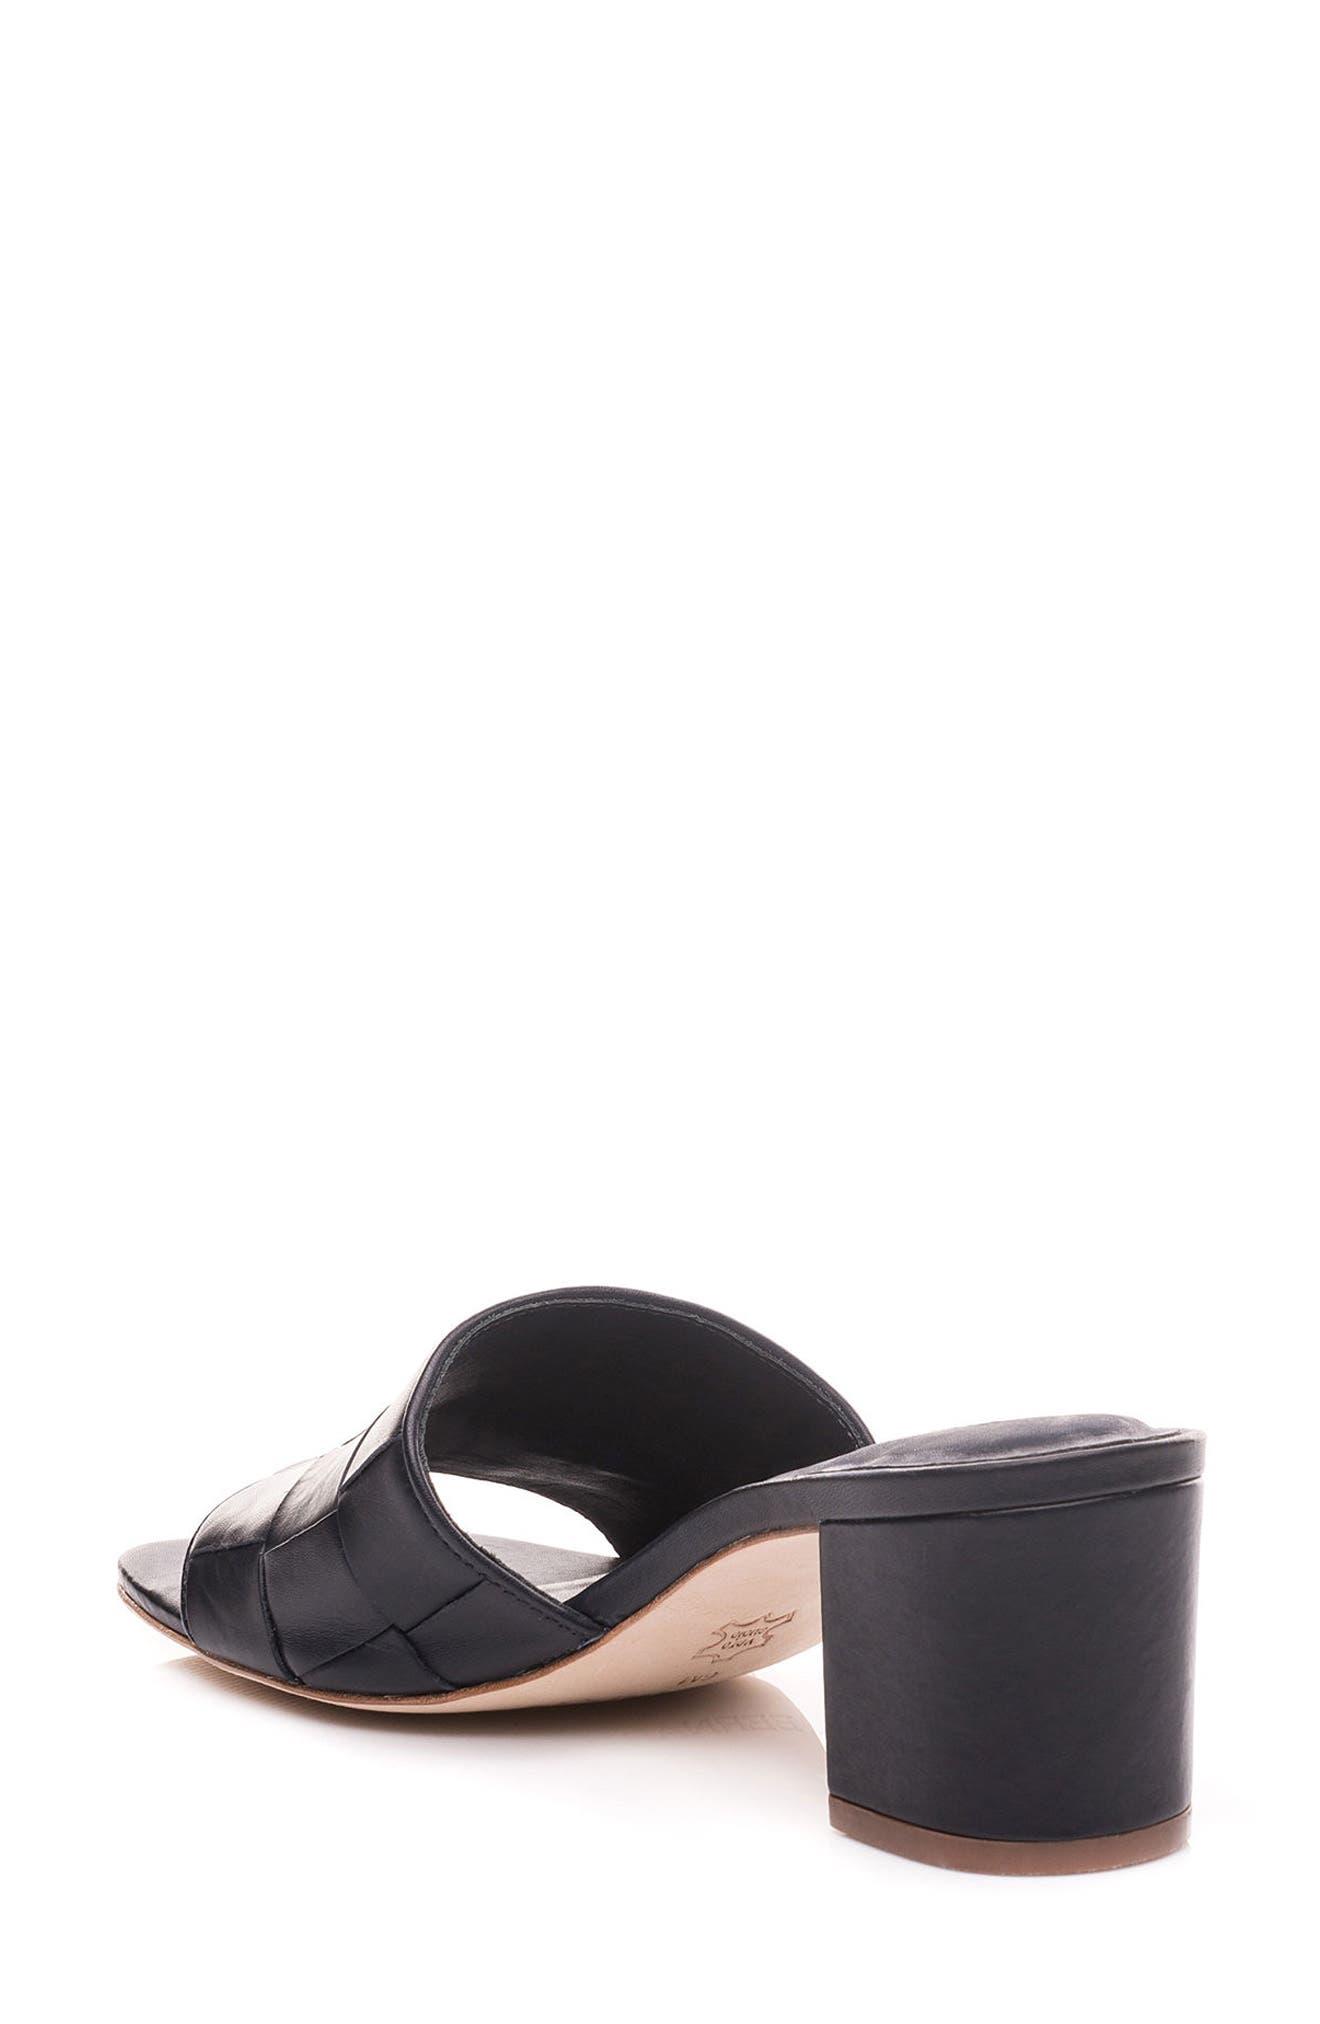 Alternate Image 2  - Bernardo Bridget Block Heel Sandal (Women)